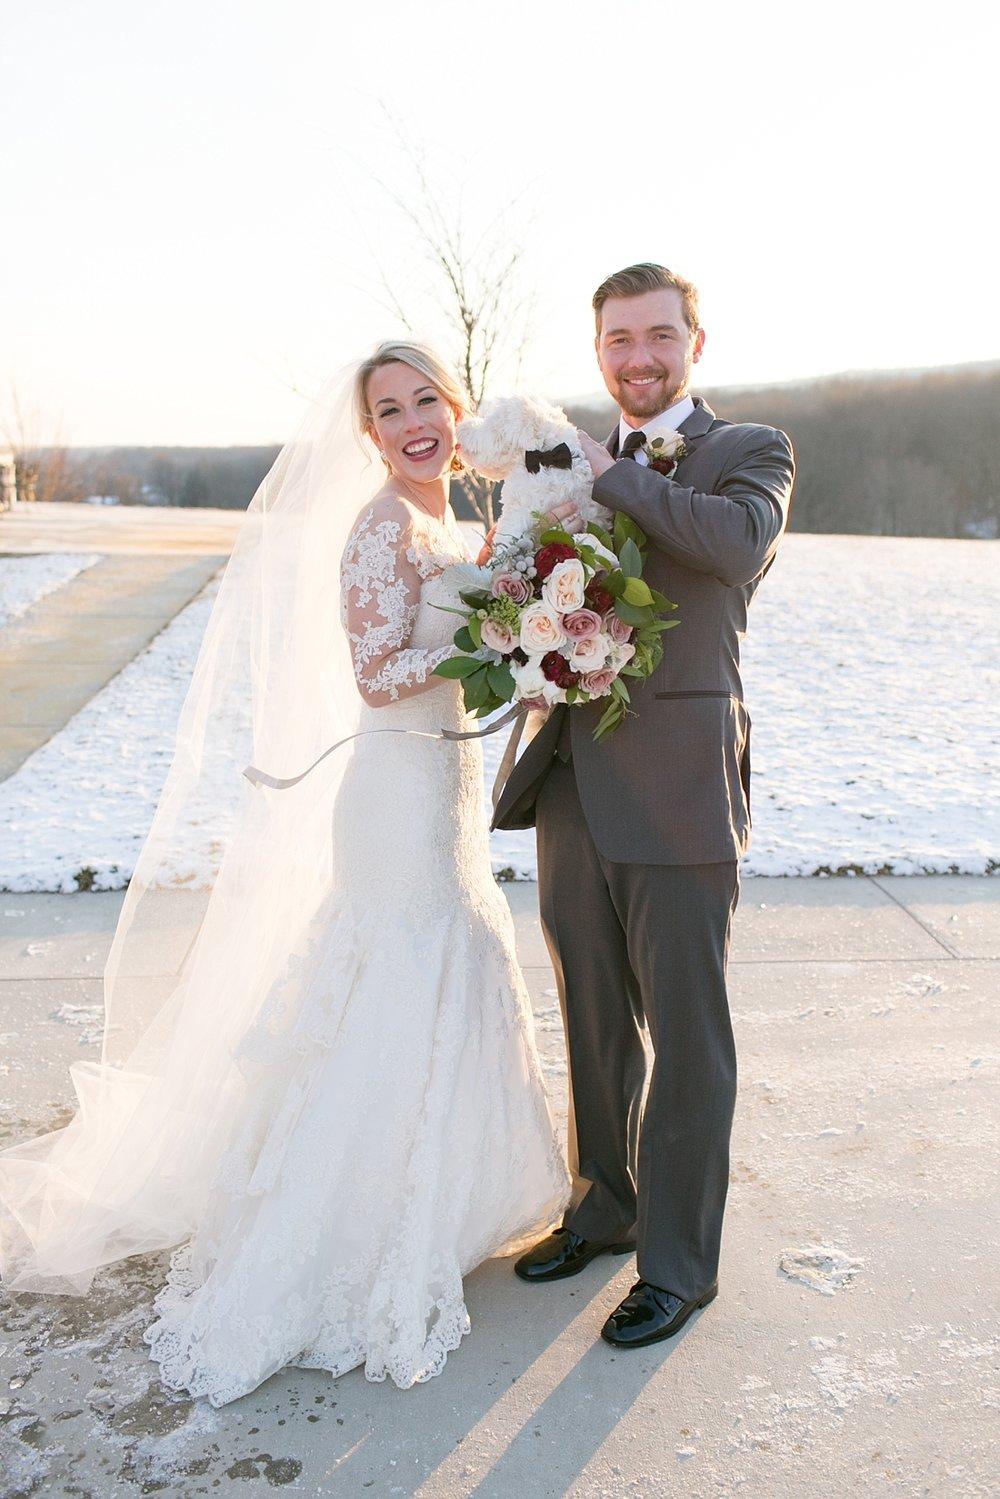 Marryland Weddings Romantic Winter Garden Springfield Manor Thurmont MD Brittany Thomas Photography_0788.jpg